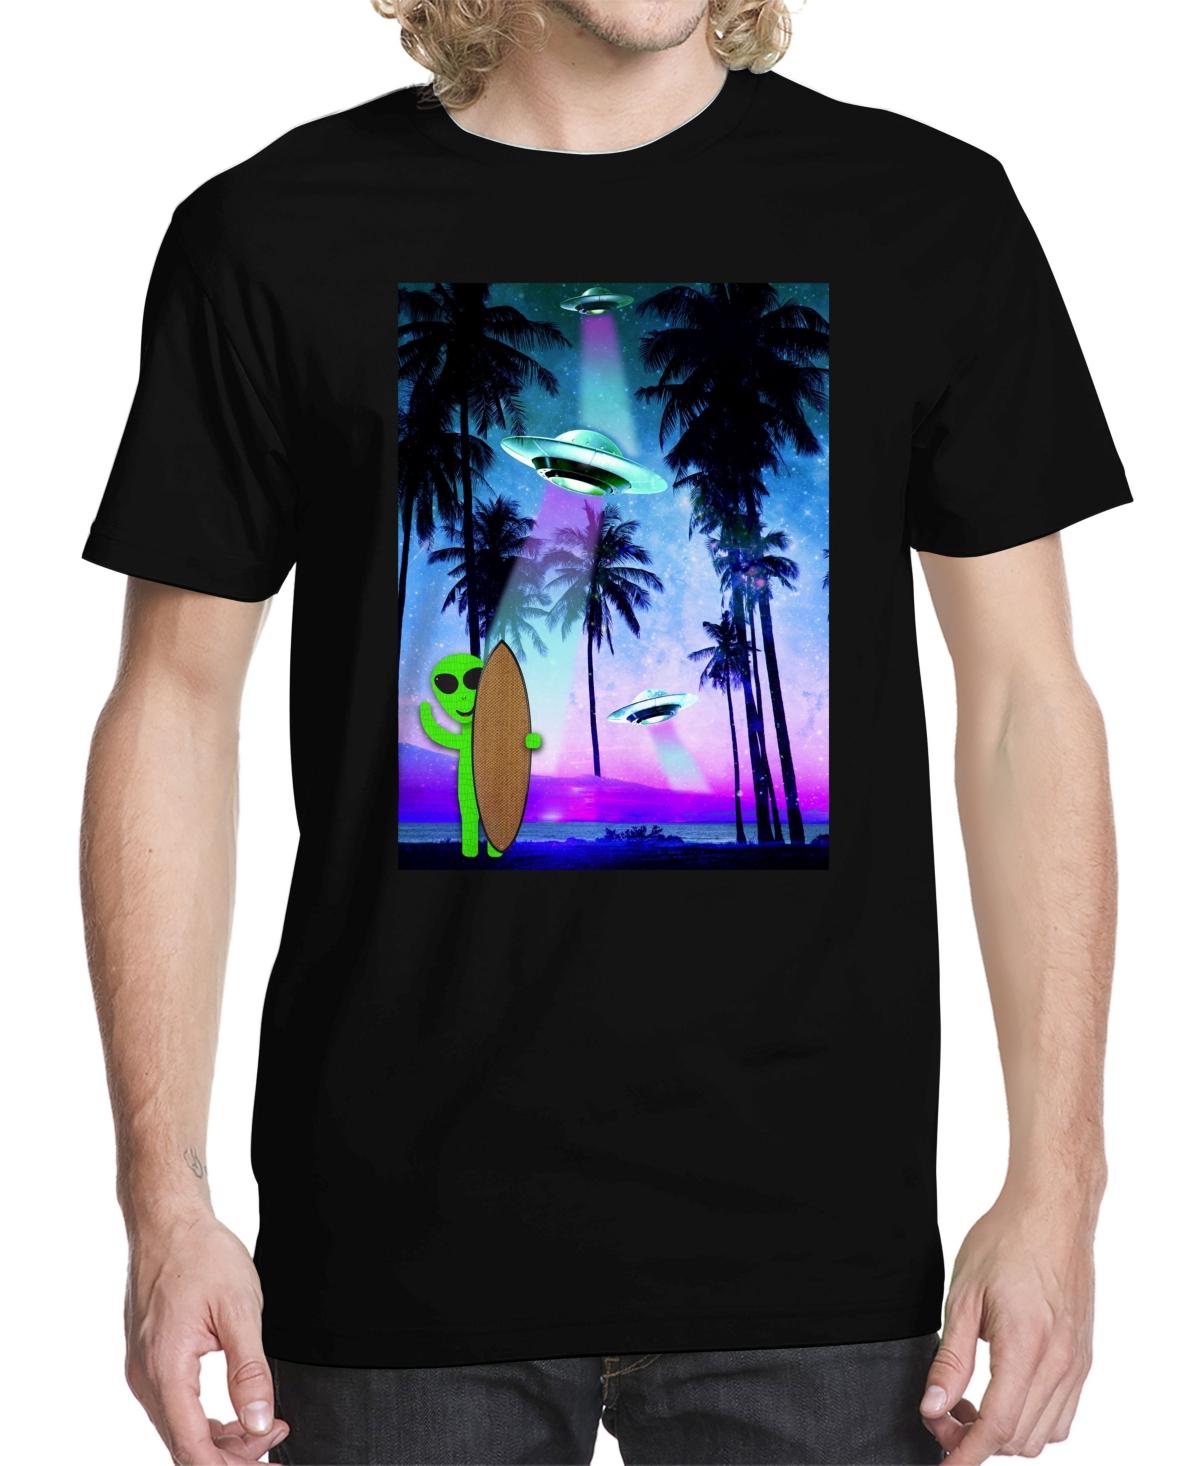 Men's Tropical Space Graphic T-shirt